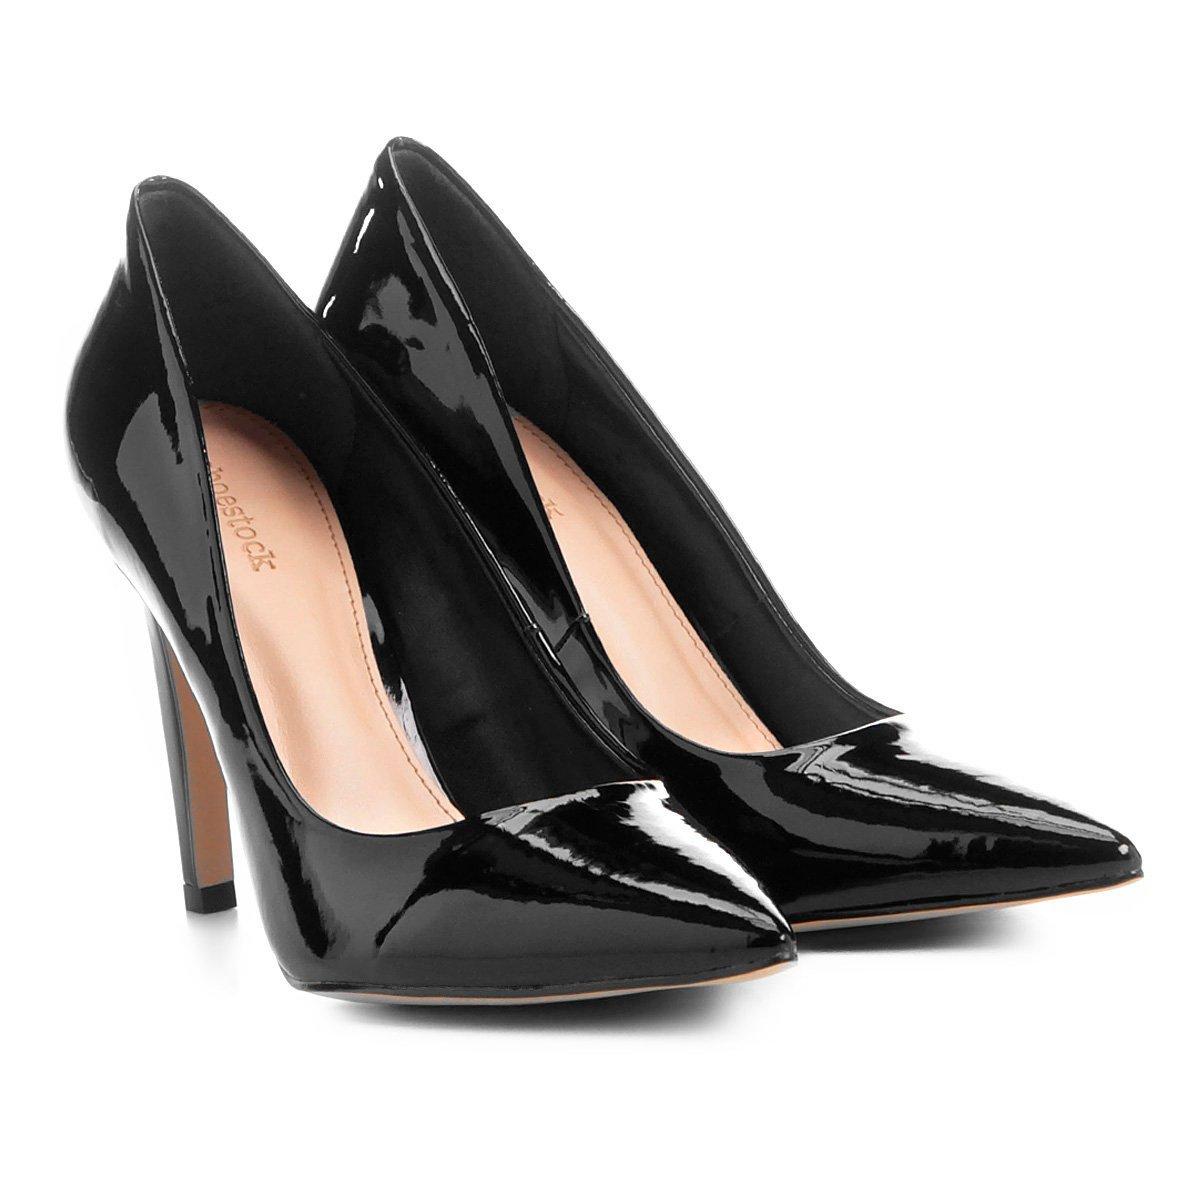 ebff68ece6f5 Scarpin Shoestock Salto Alto Bico Fino | Shoestock